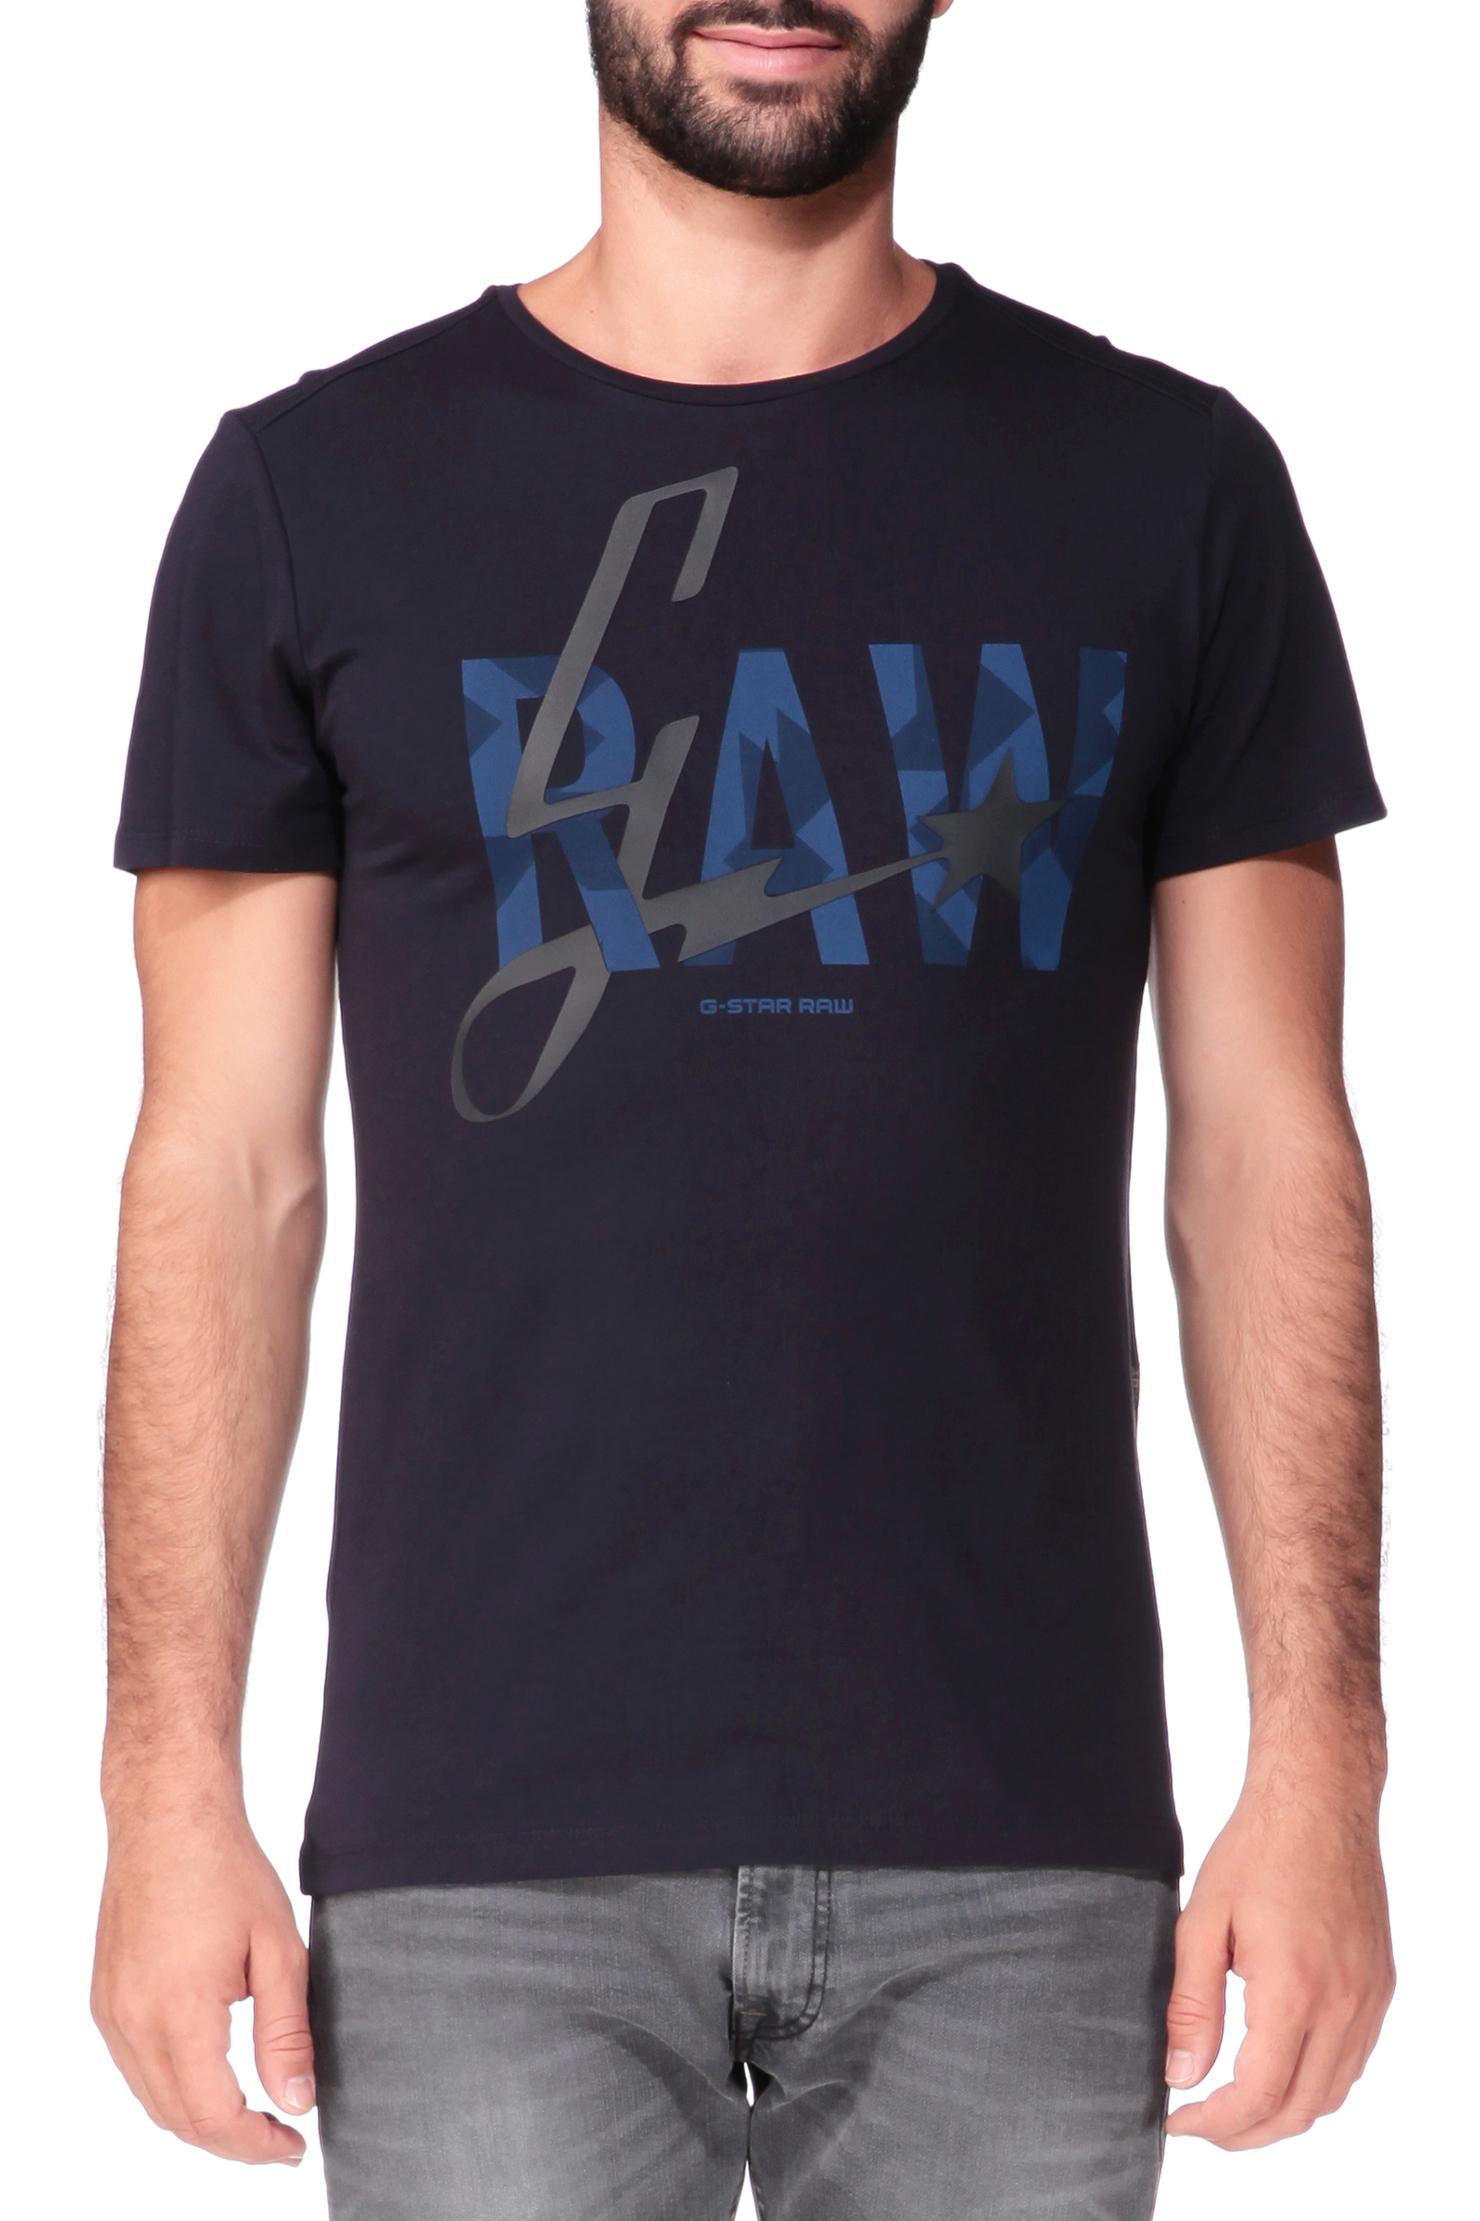 g star raw short sleeve t shirt in blue for men lyst. Black Bedroom Furniture Sets. Home Design Ideas